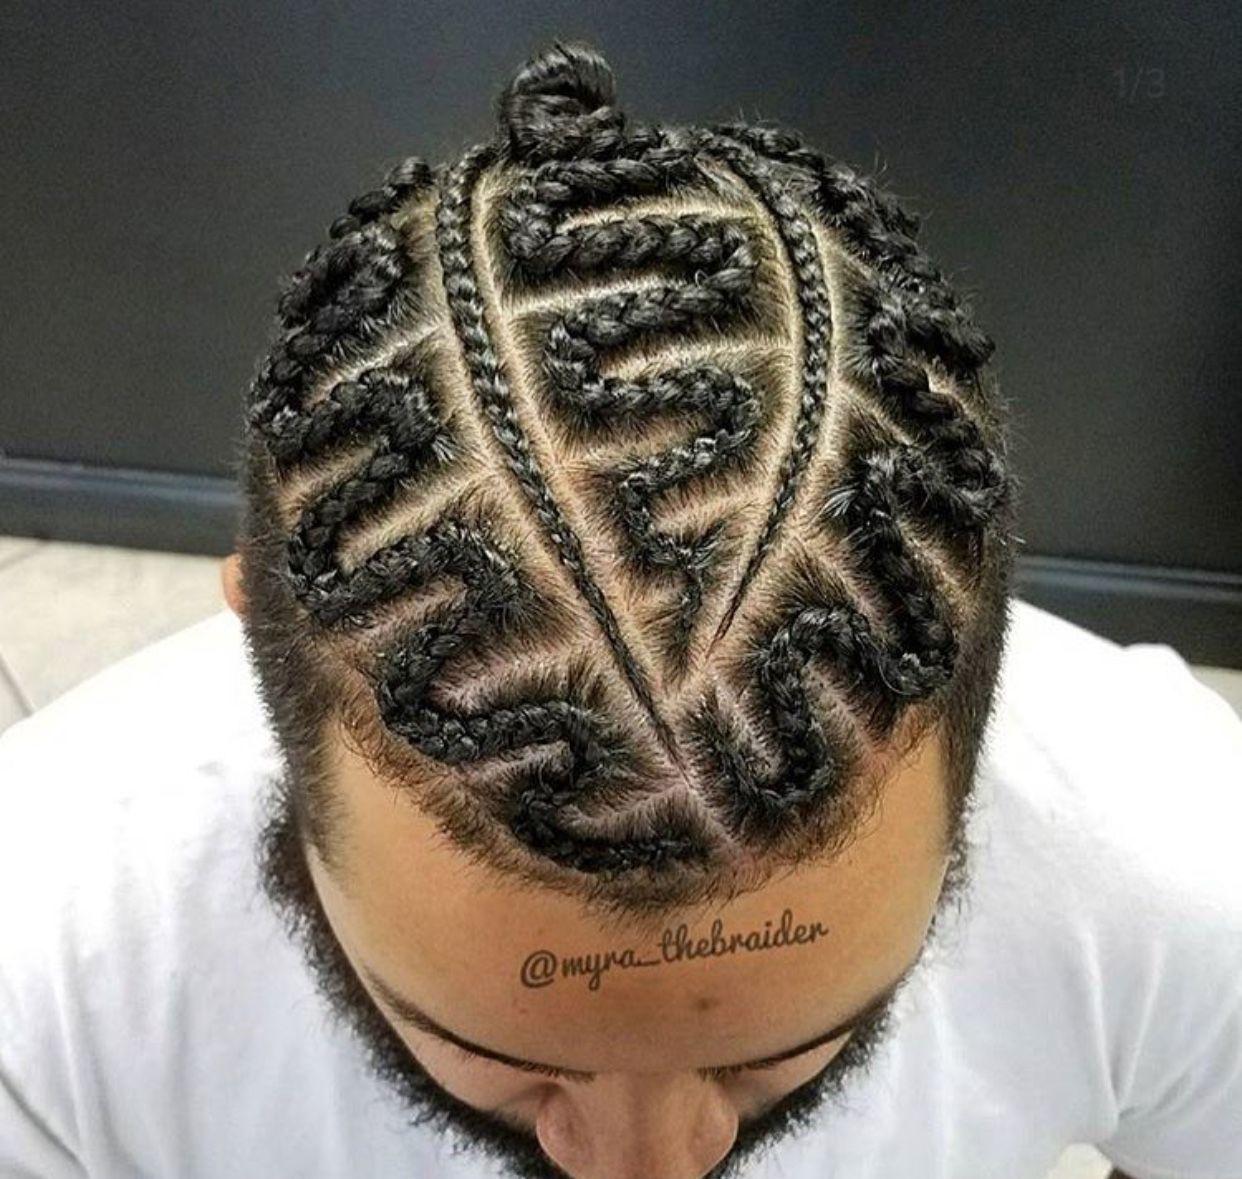 Pin by Varnell Hill on Braid hair style | Pinterest | Man braids ...